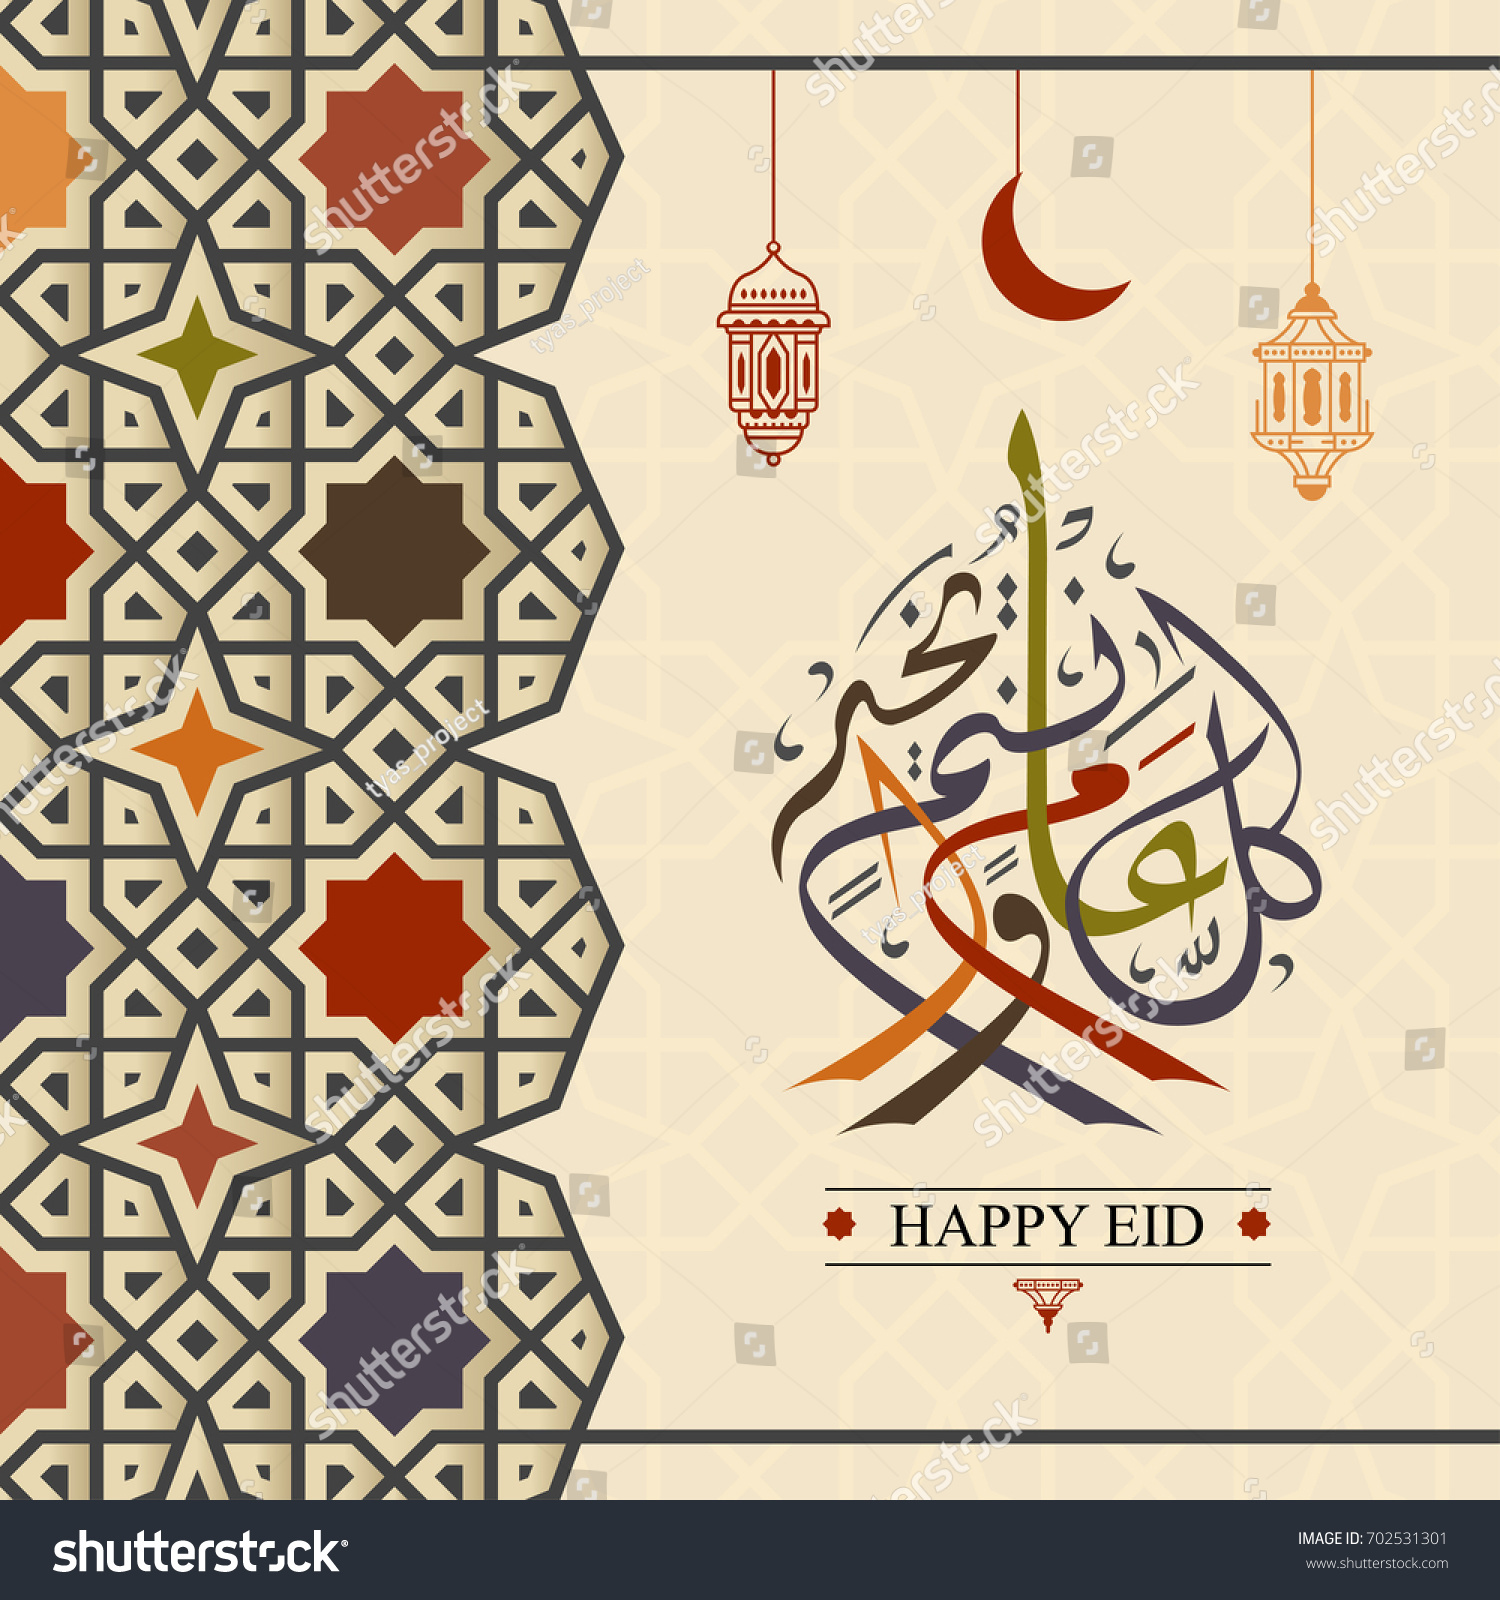 eid mubarak and happy new year greetings card in arabic calligraphy arabic islamic calligraphy of